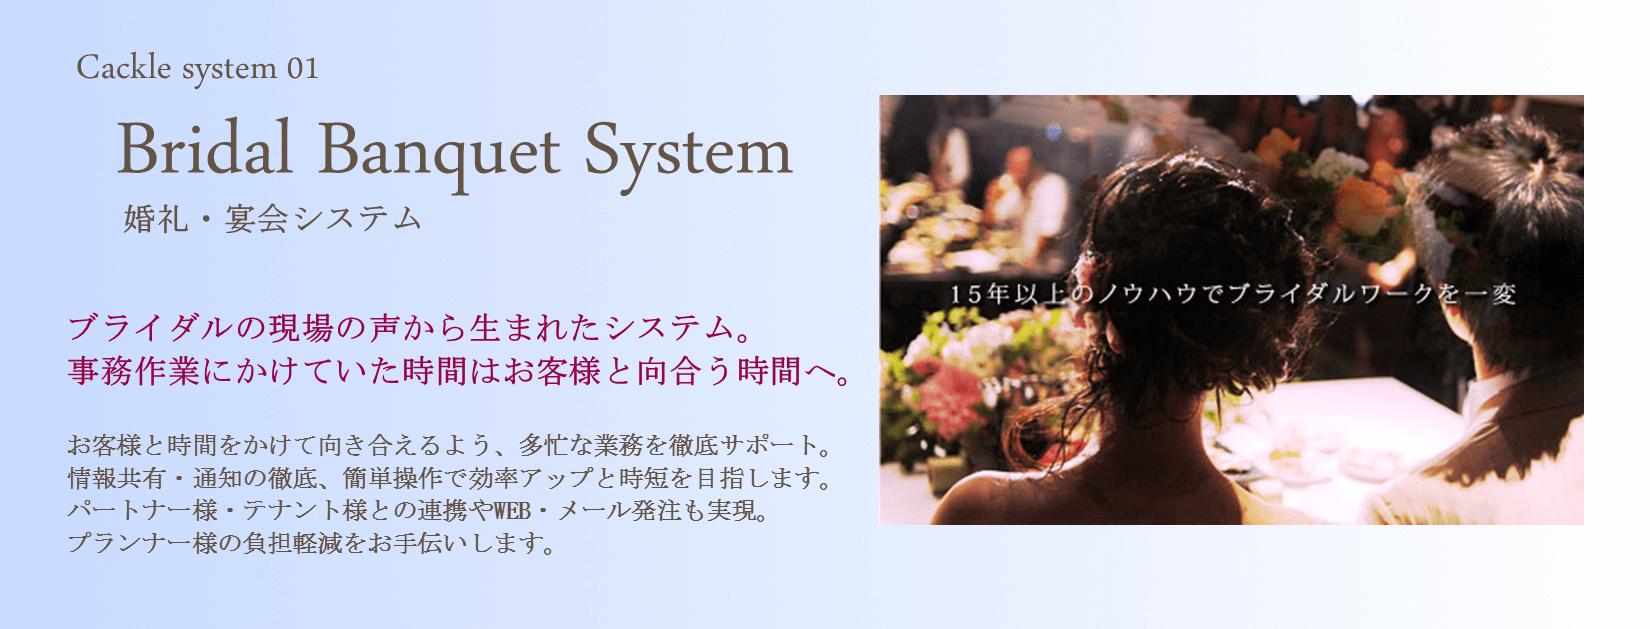 Cackle婚礼宴会システムブライダルシステム。 ブライダルの現場の声から生まれた婚礼宴会システム。 事務作業にかけていた時間はお客様と向き合う時間へ。 お客様と時間をかけて向き合えるよう、多忙なブライダル業務を徹底サポート。 情報共有・通知の徹底、簡単操作で効率アップと時短を目指すブライダルシステムです。 パートナー様・テナント様との連携やWEB・メール発注も実現。 プランナー様の負担軽減をお手伝いします。